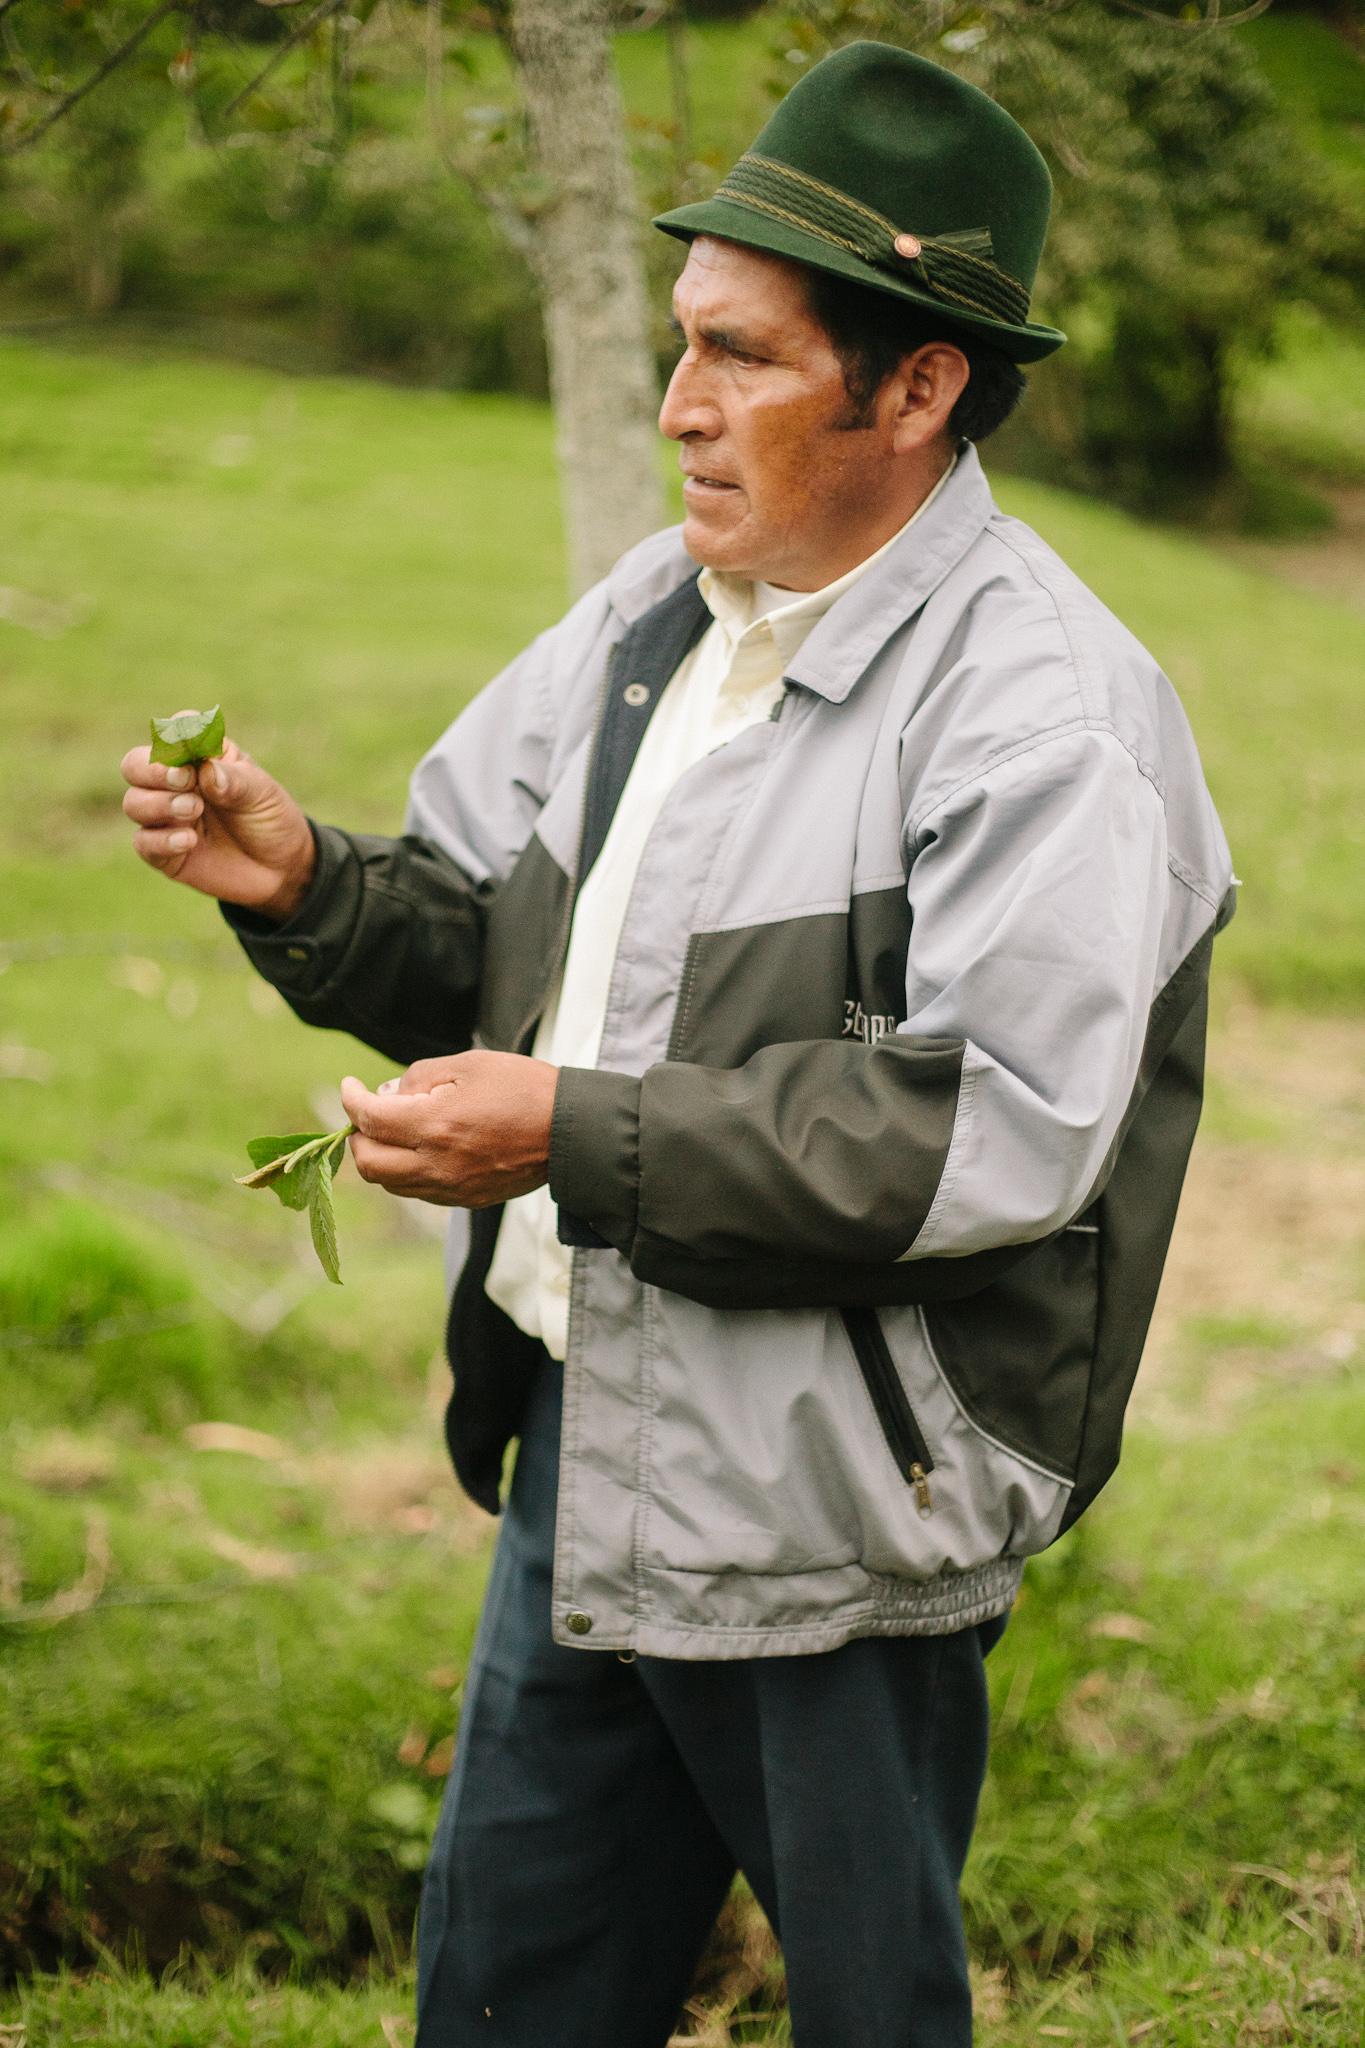 Ecuador2011_Mountains&Sea_Web_jenniferleahy-016.jpg